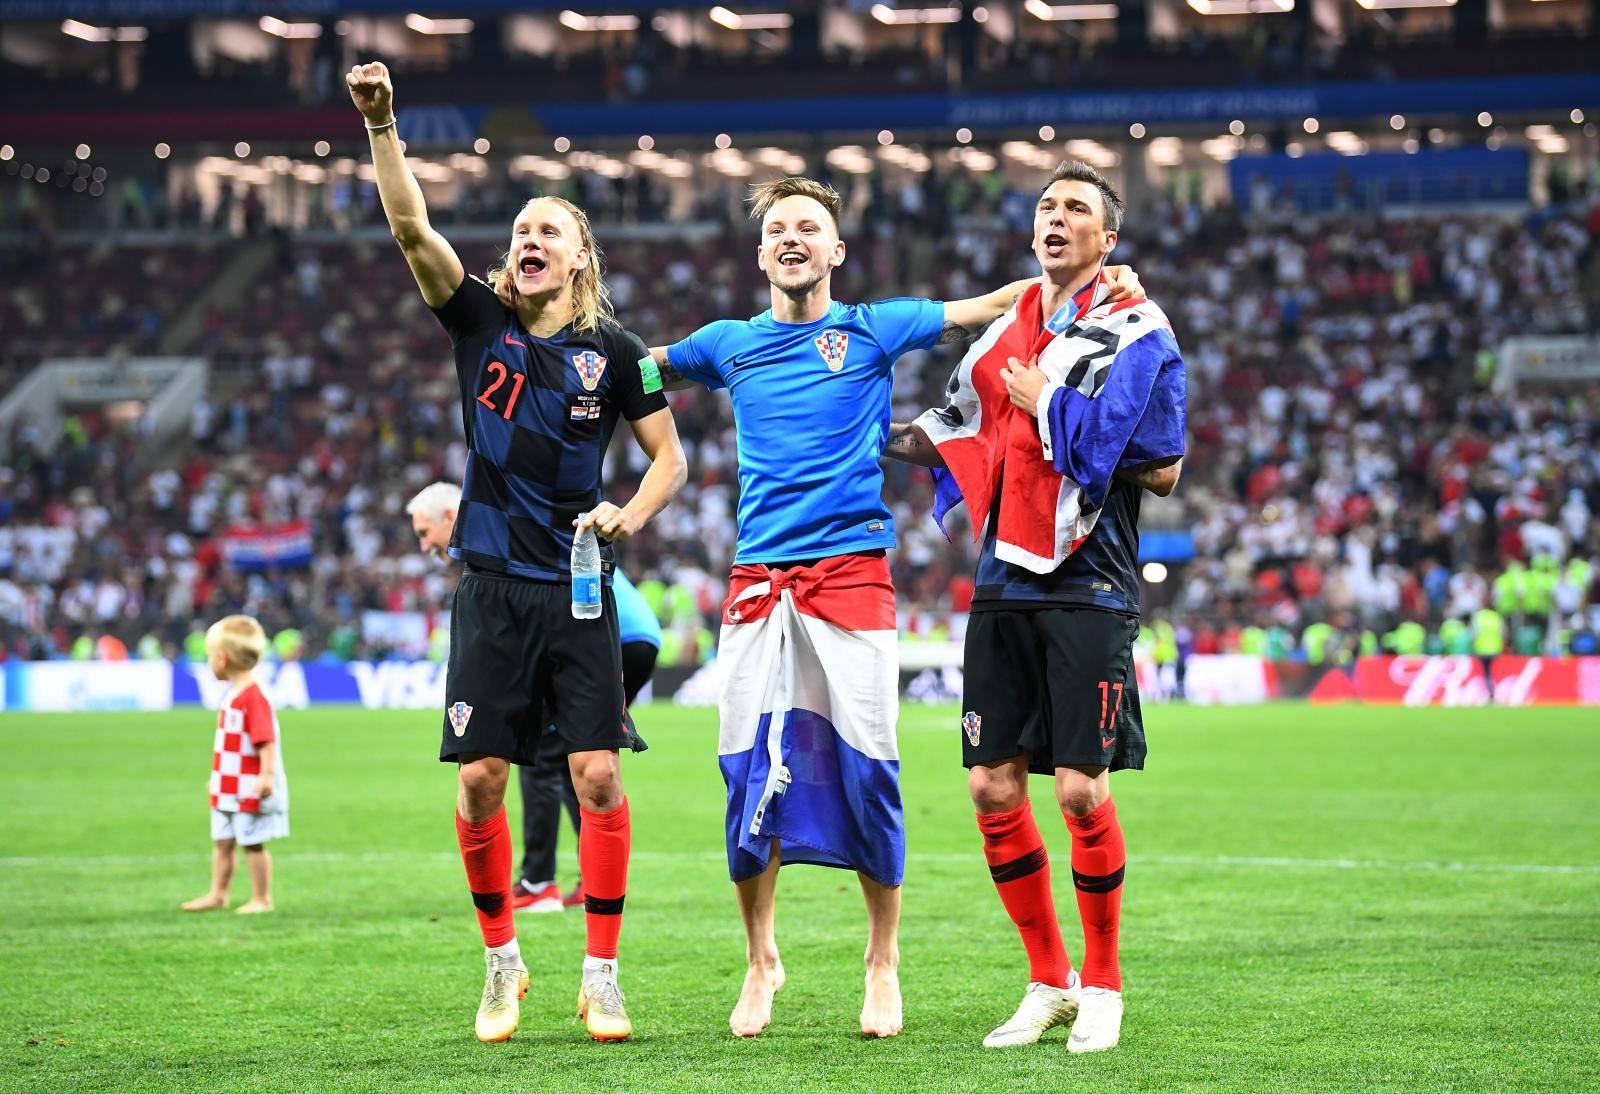 GES / Football / World Cup 2018 / Croatia - England, Match 62, 11.07.2018